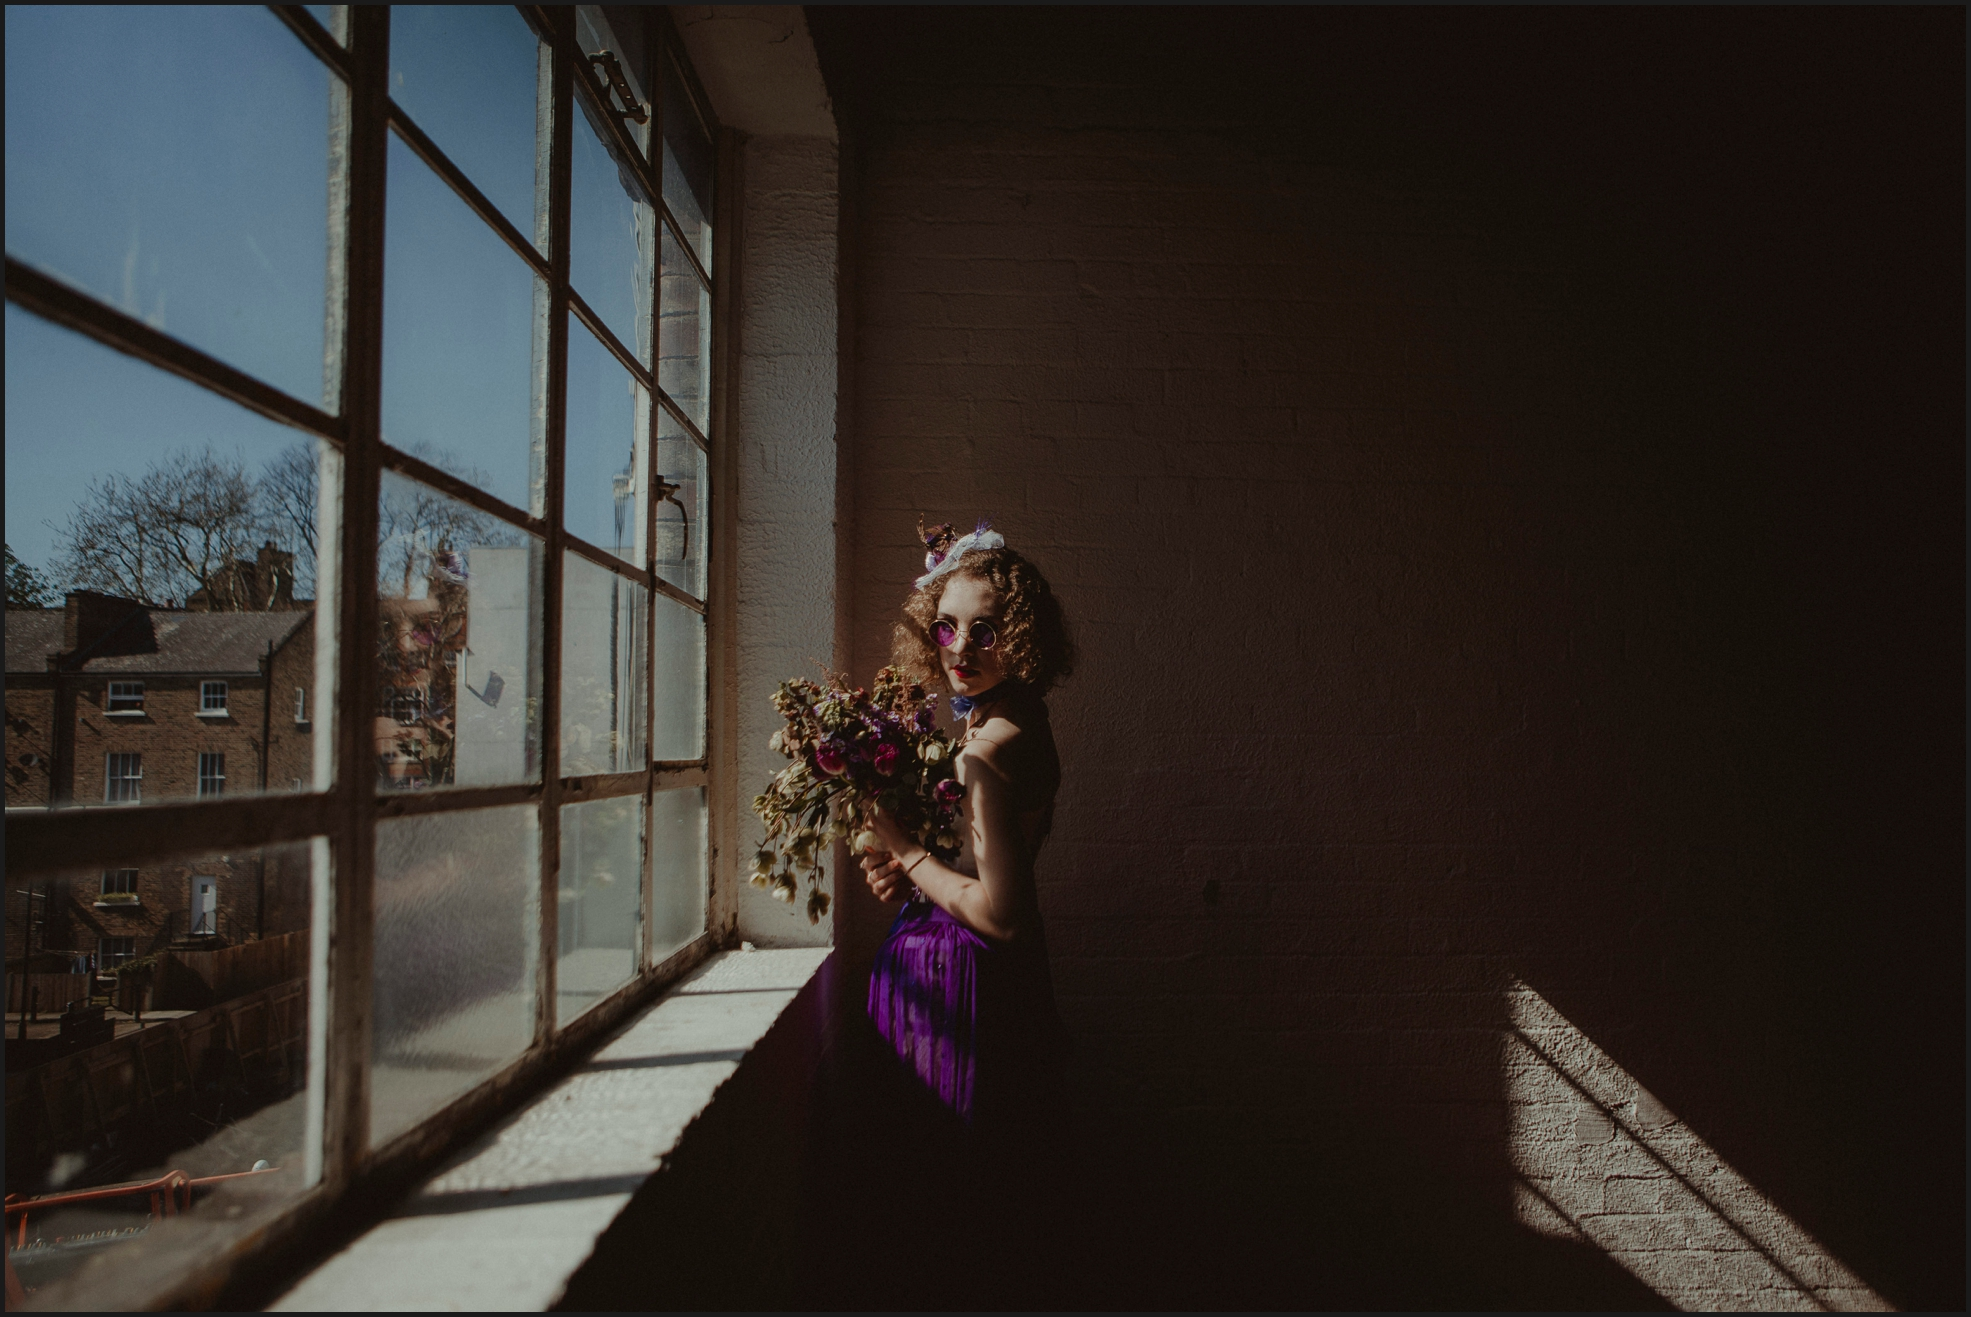 bride, window, light, wedding, windowpane, bouquet, sunglasses